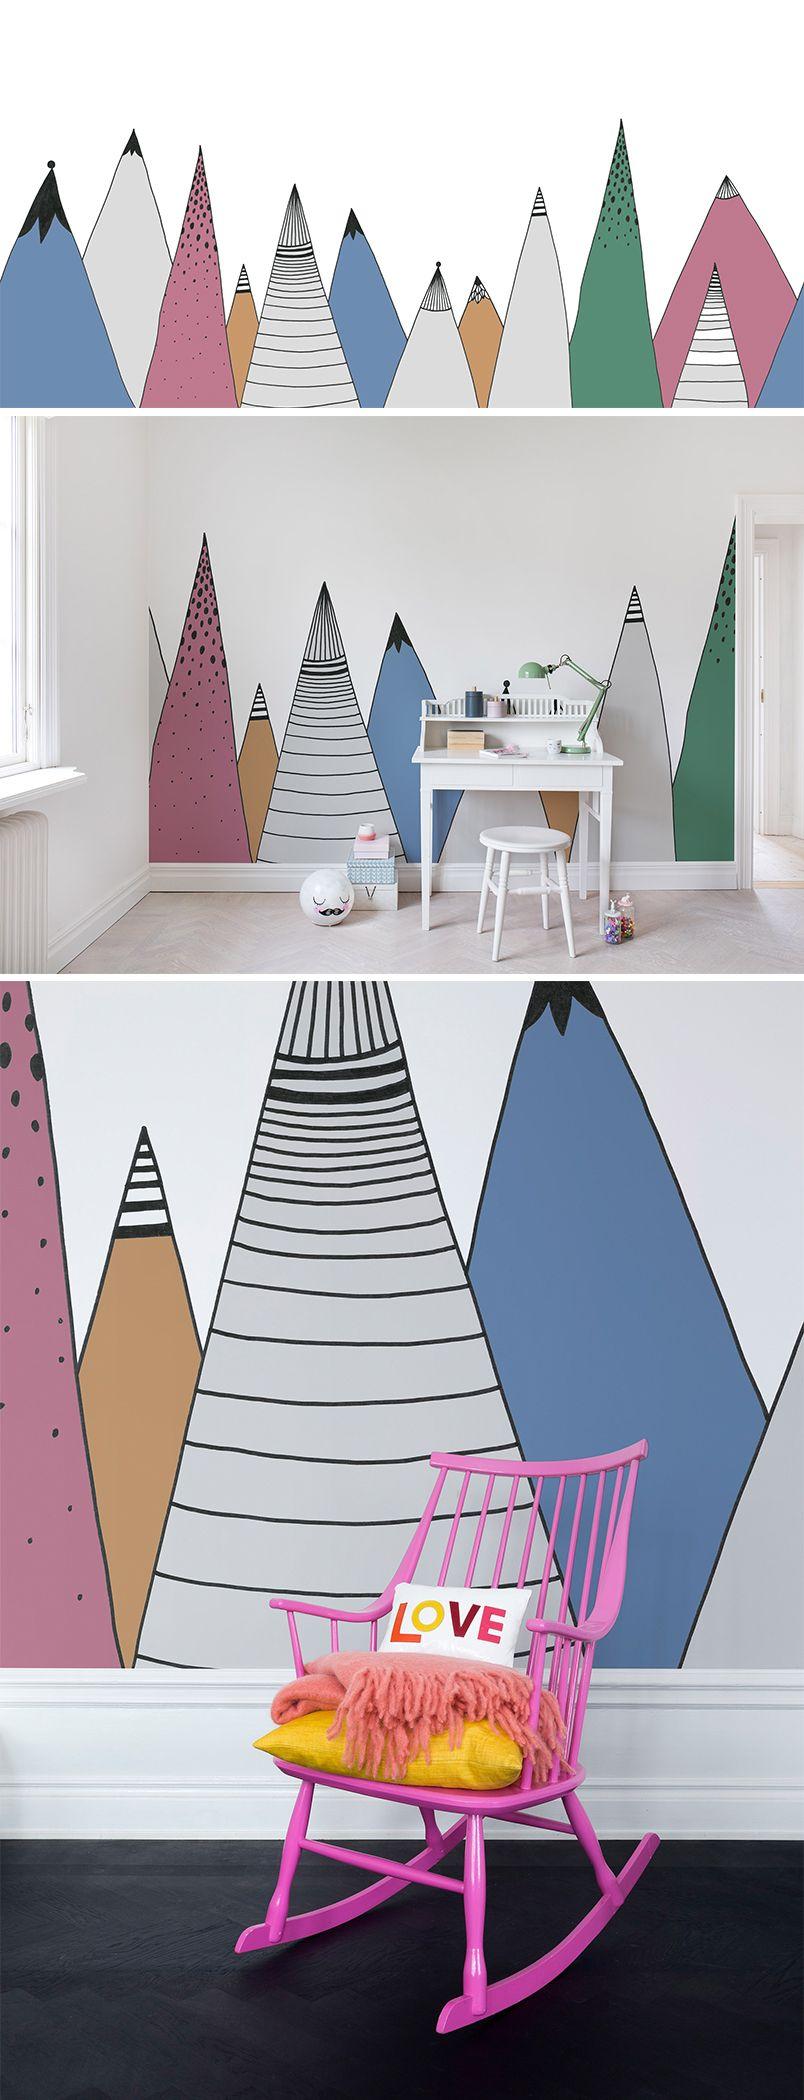 Kids Room Wallpaper Designs: Kids Room Murals, Kids Room Wall